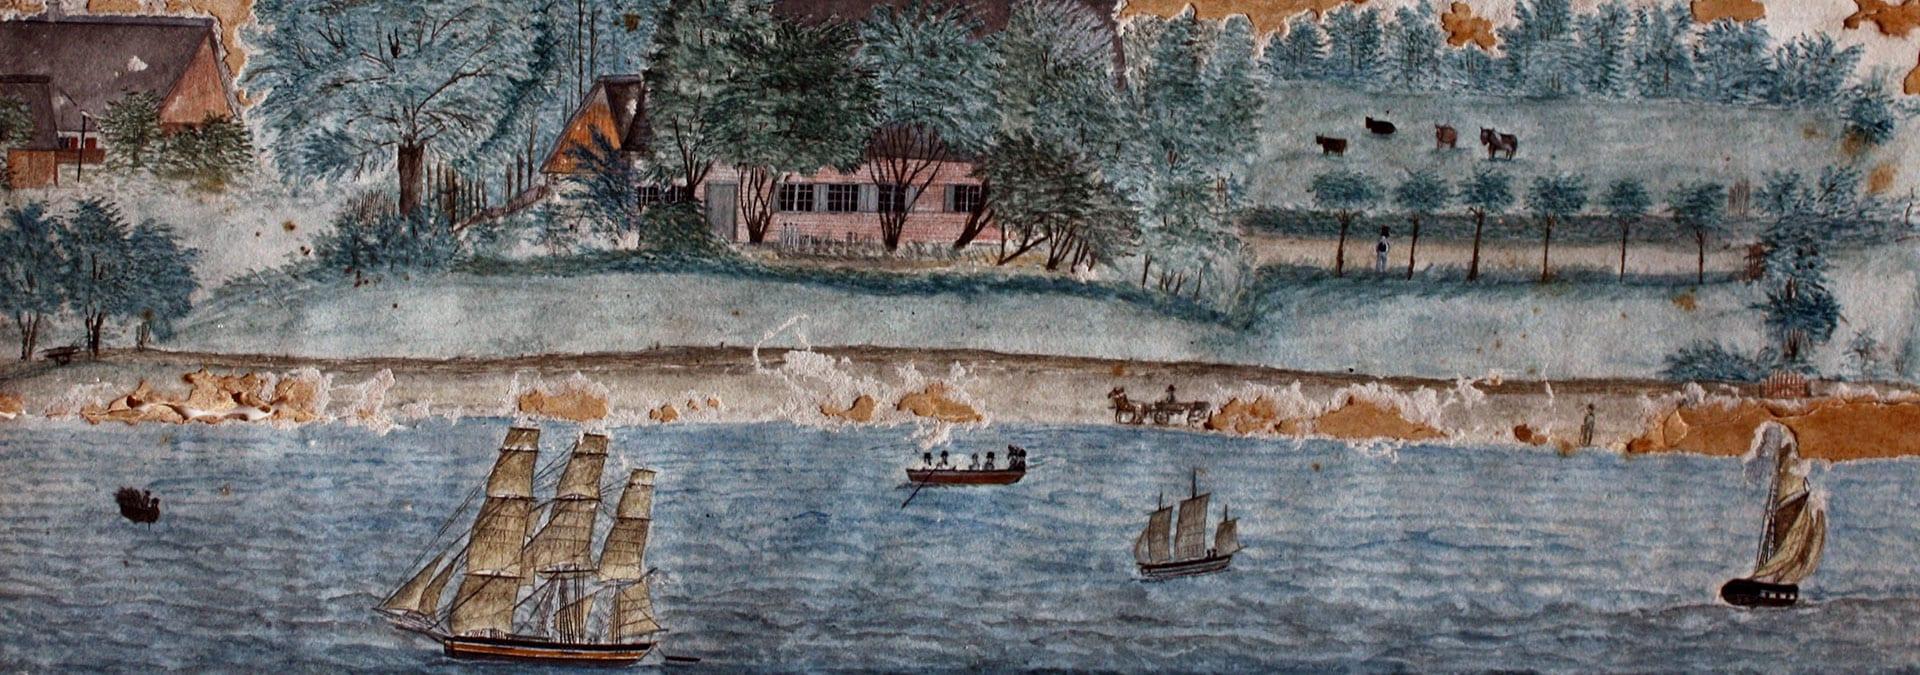 FOREDRAG: Landbrug og søfart på Løjt